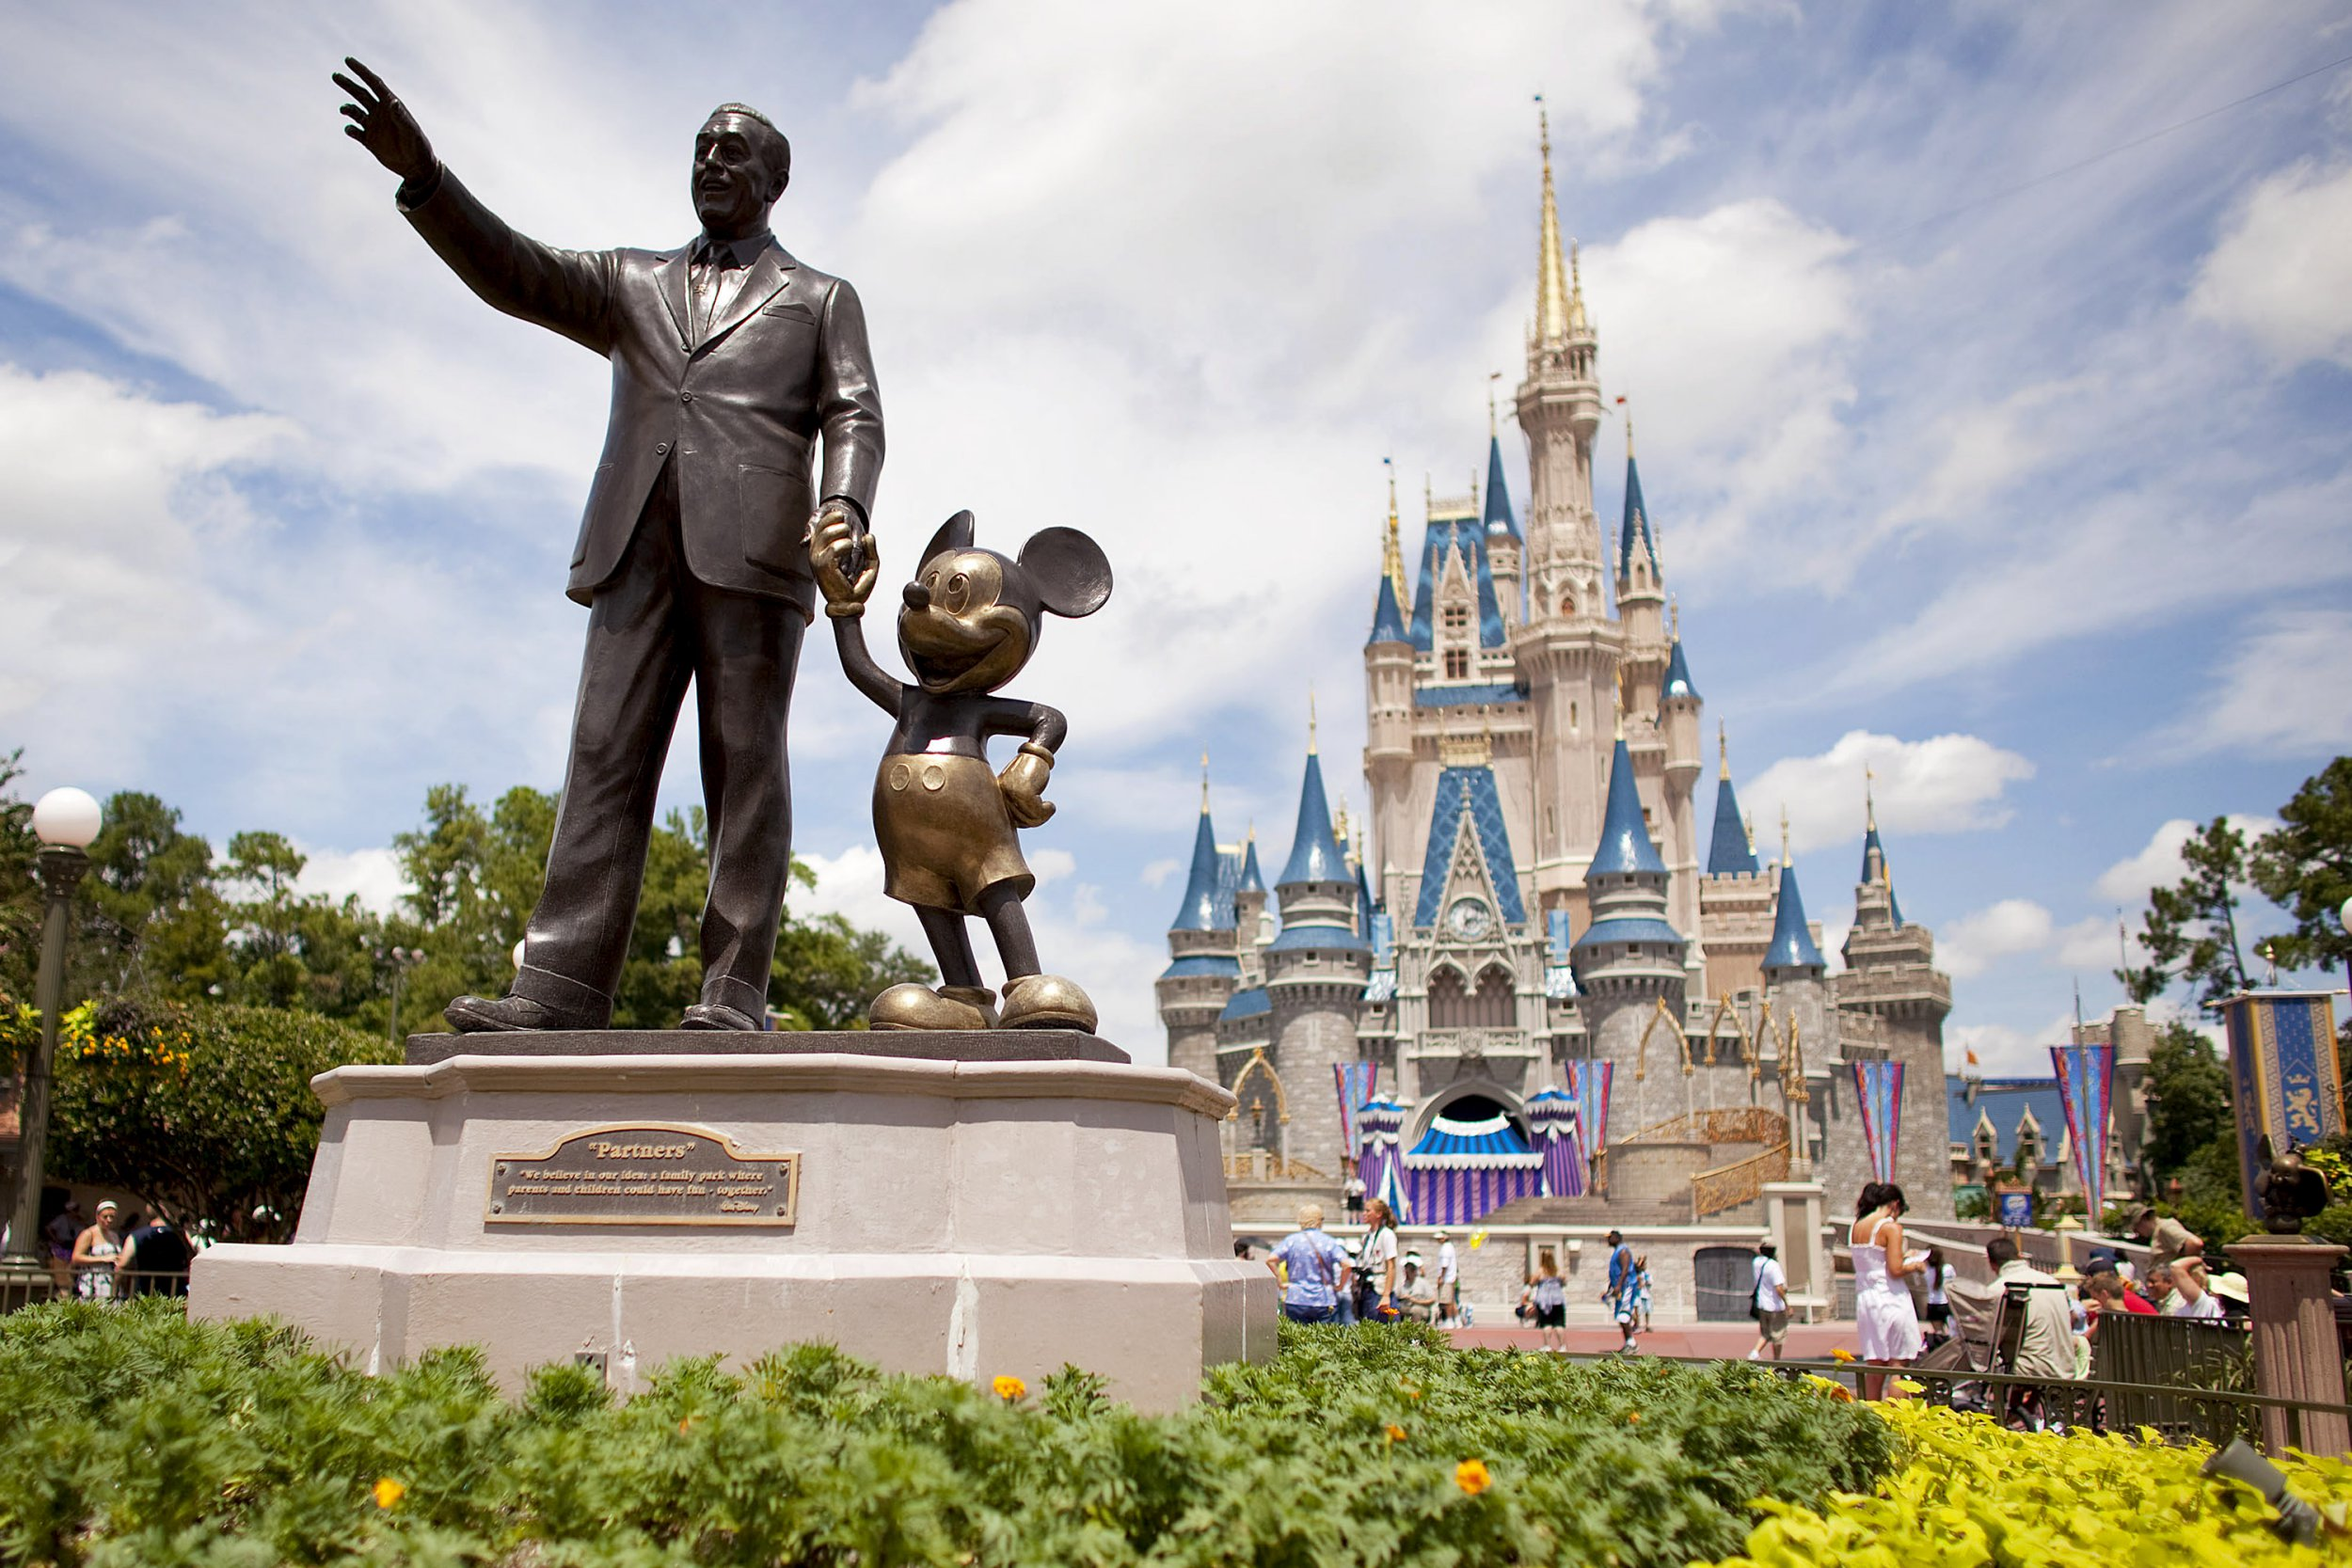 Disney's net worth following the huge deal to buy Fox